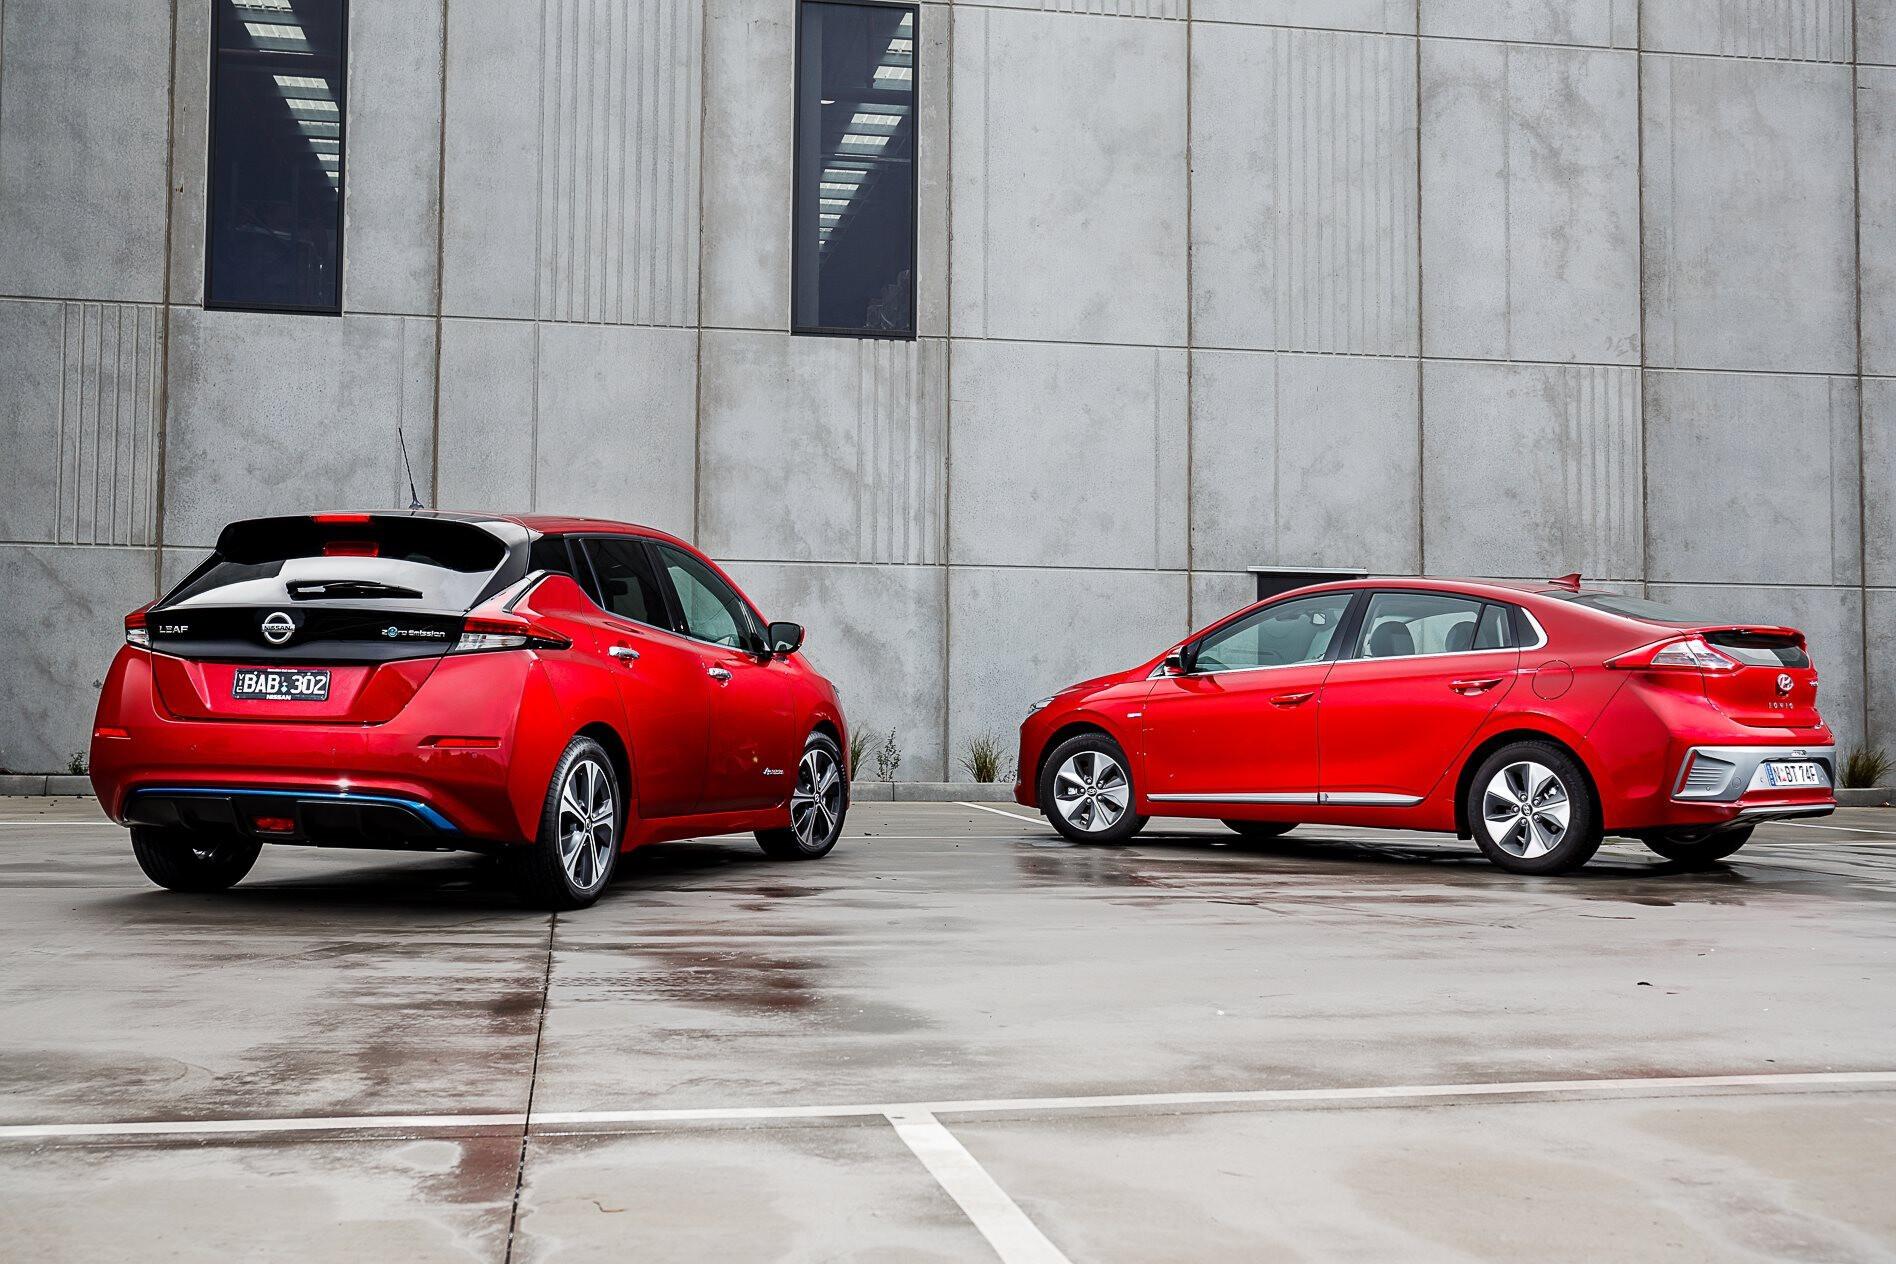 Nissan Leaf Hyundai Ioniq